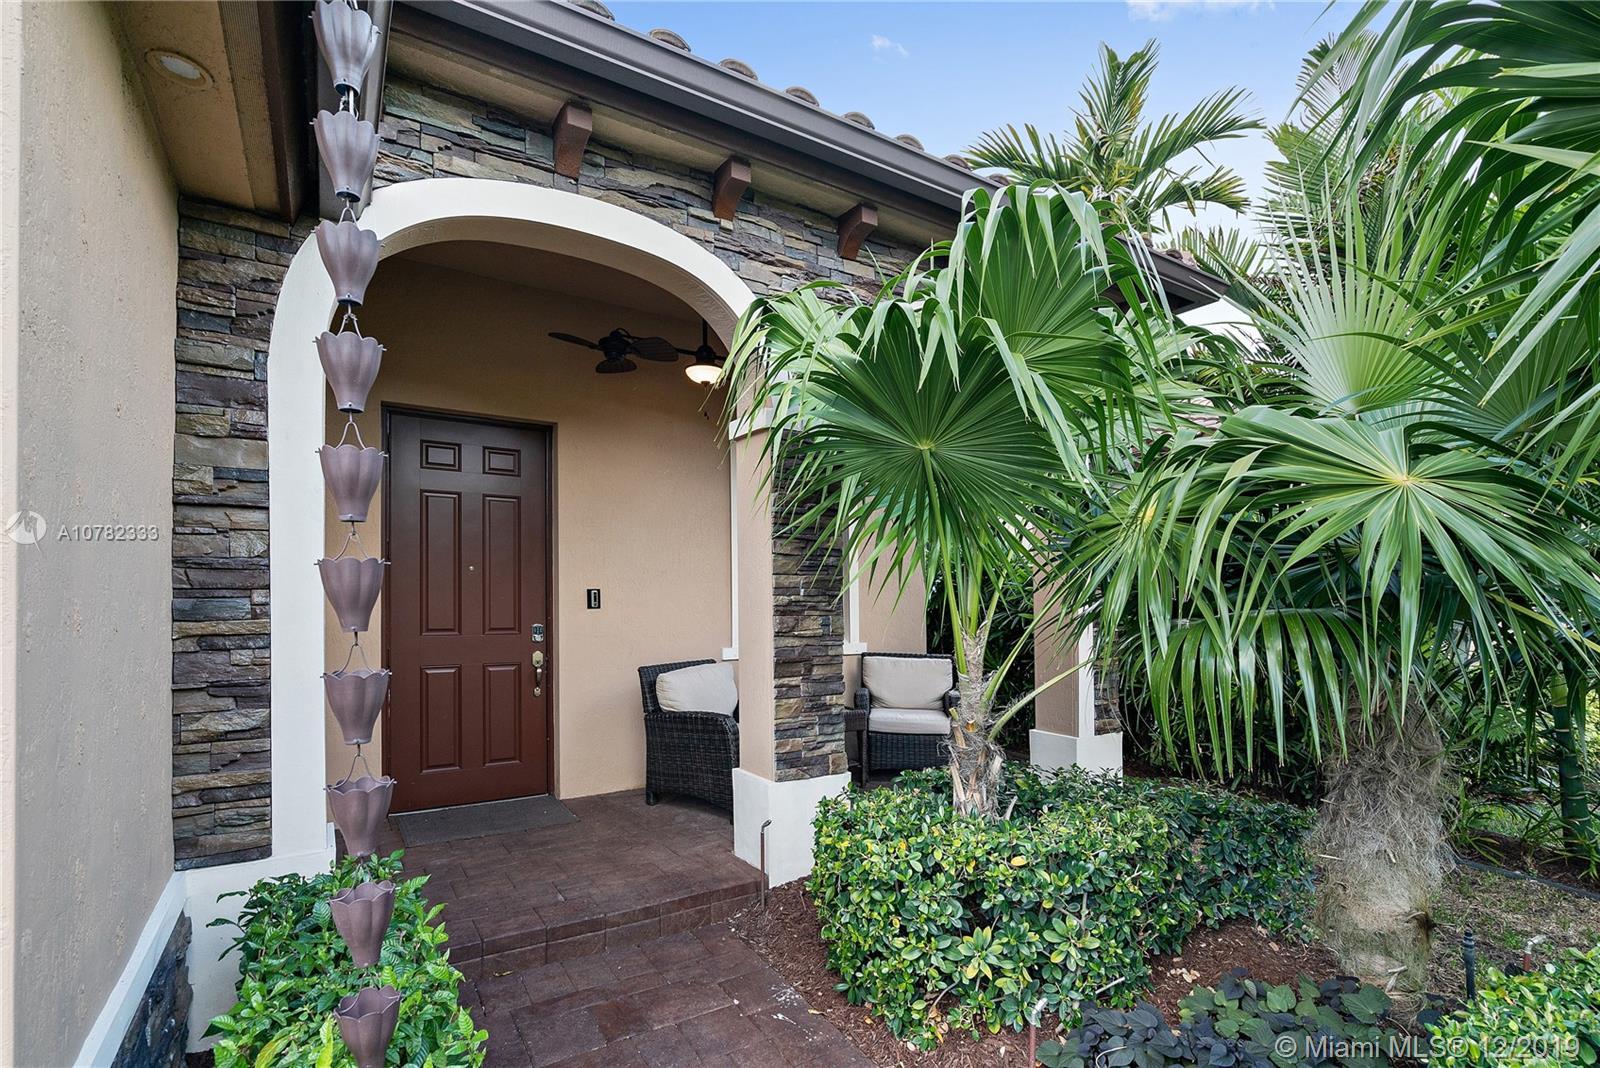 564 SE 35 Terrace, Homestead, FL 33033 - Homestead, FL real estate listing